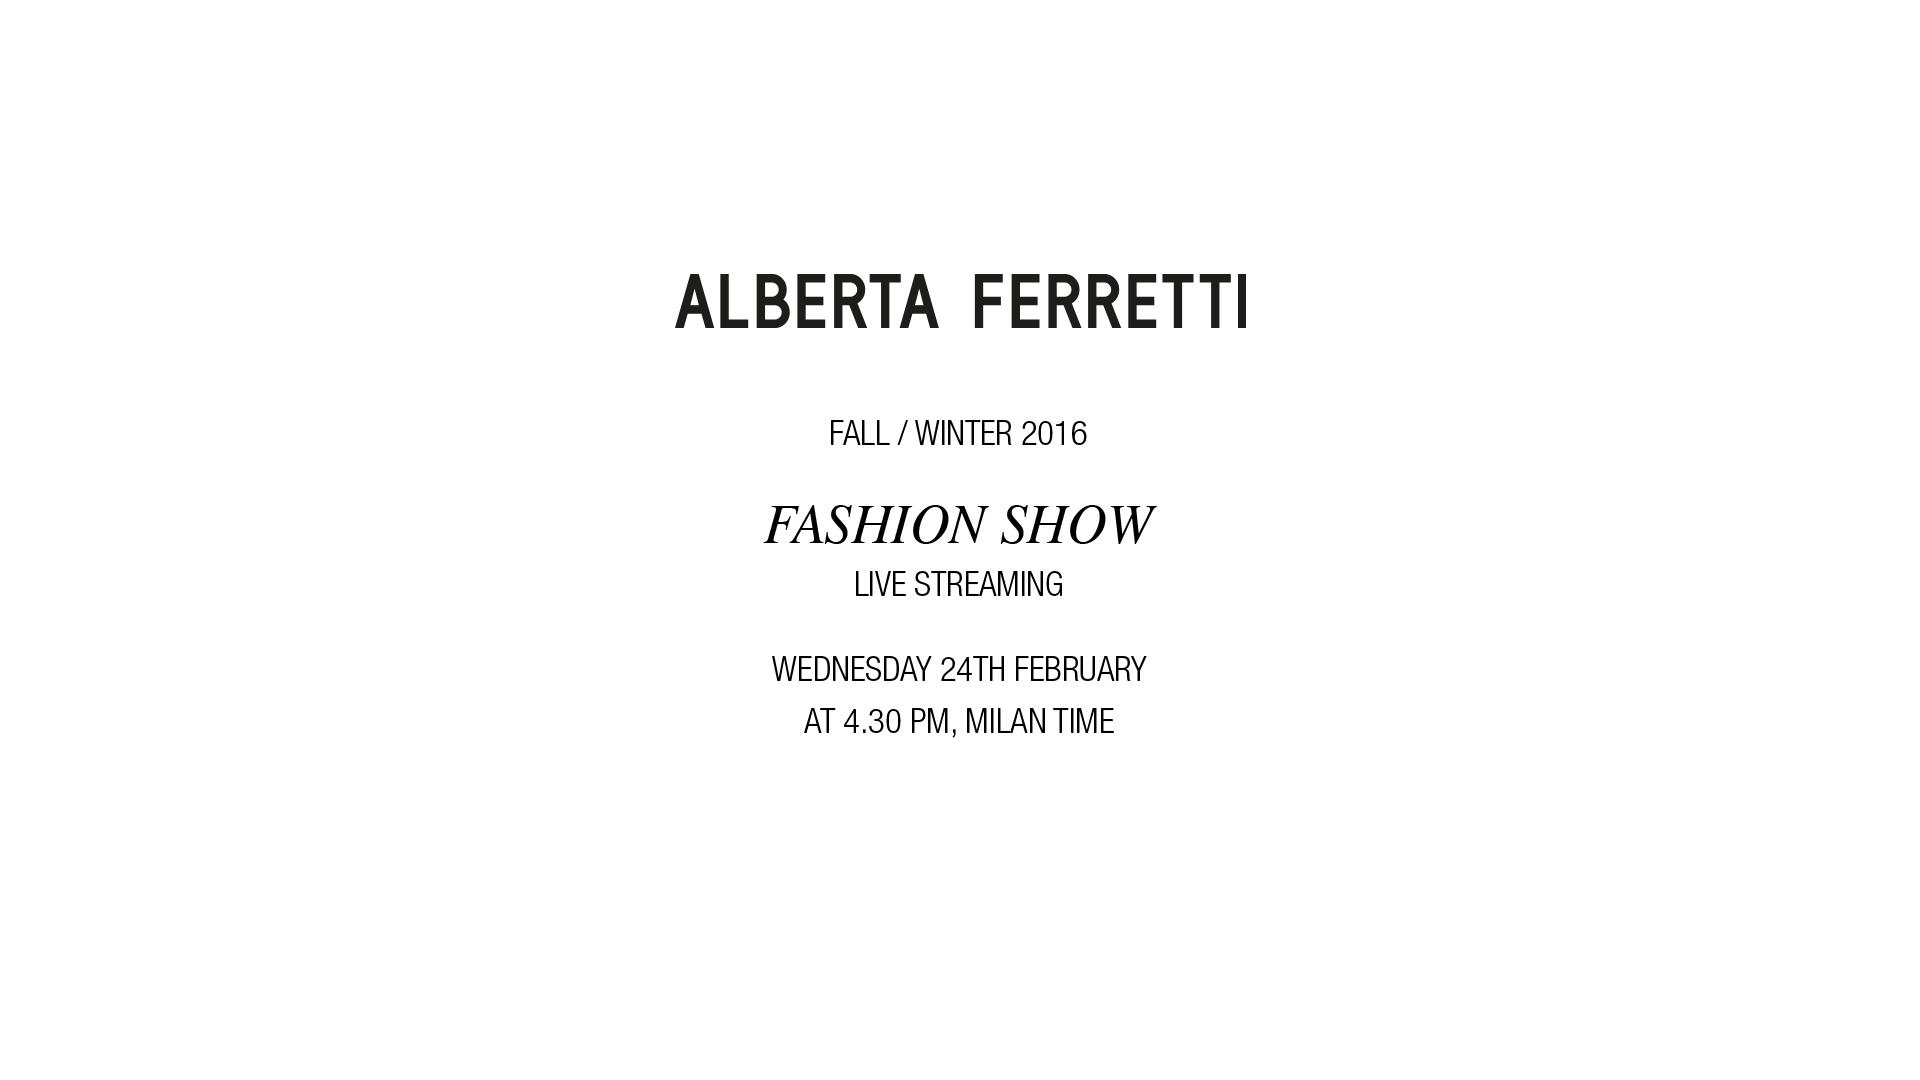 Alberta Ferretti Fall Winter 2016 Women's Fashion Show Live Streaming Milan